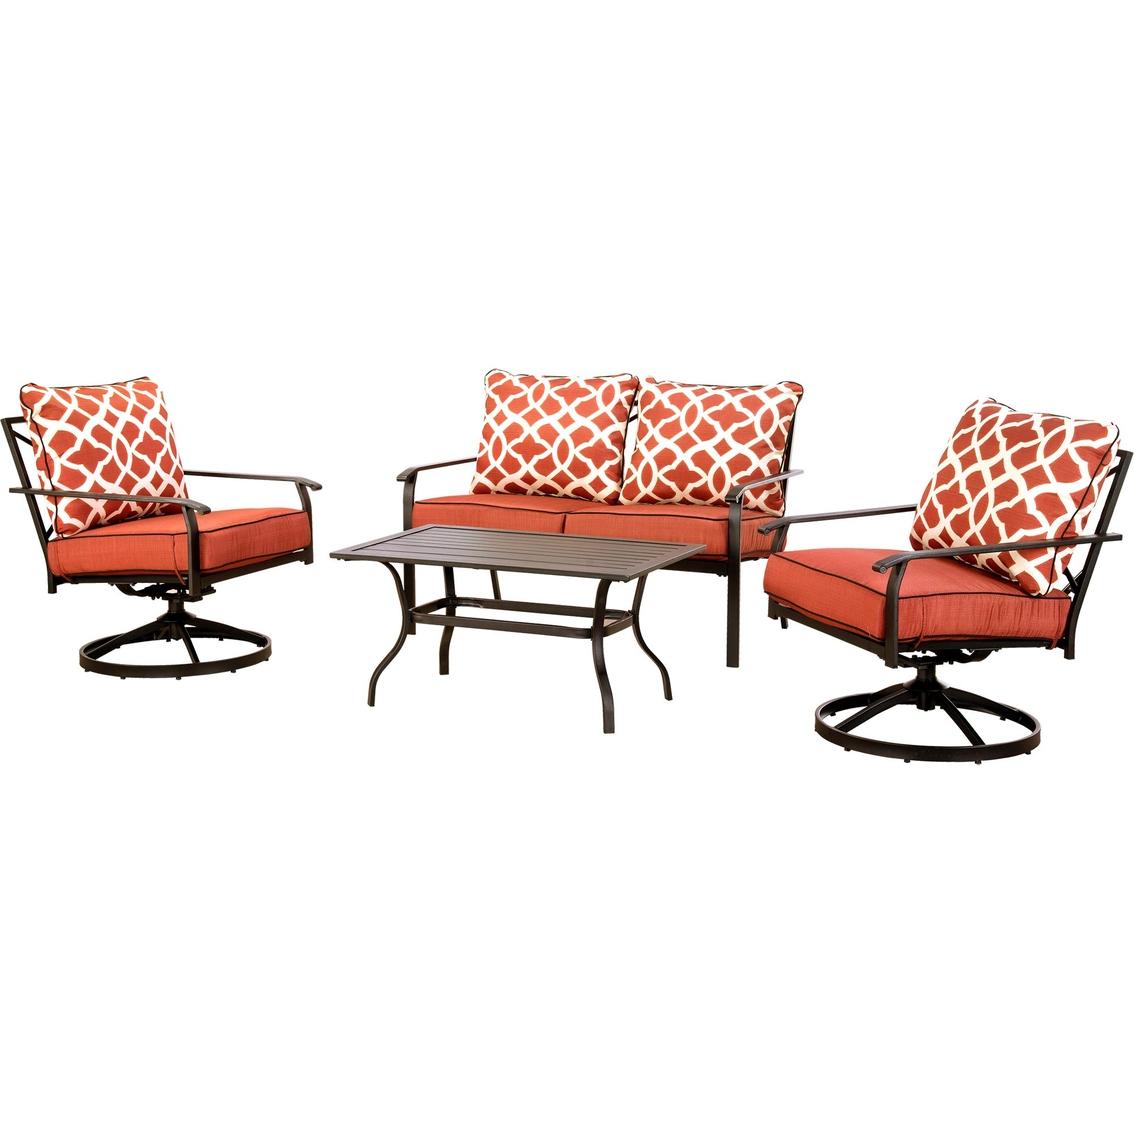 Courtyard Creations Christian 4 Pc. Cushion Sofa Set